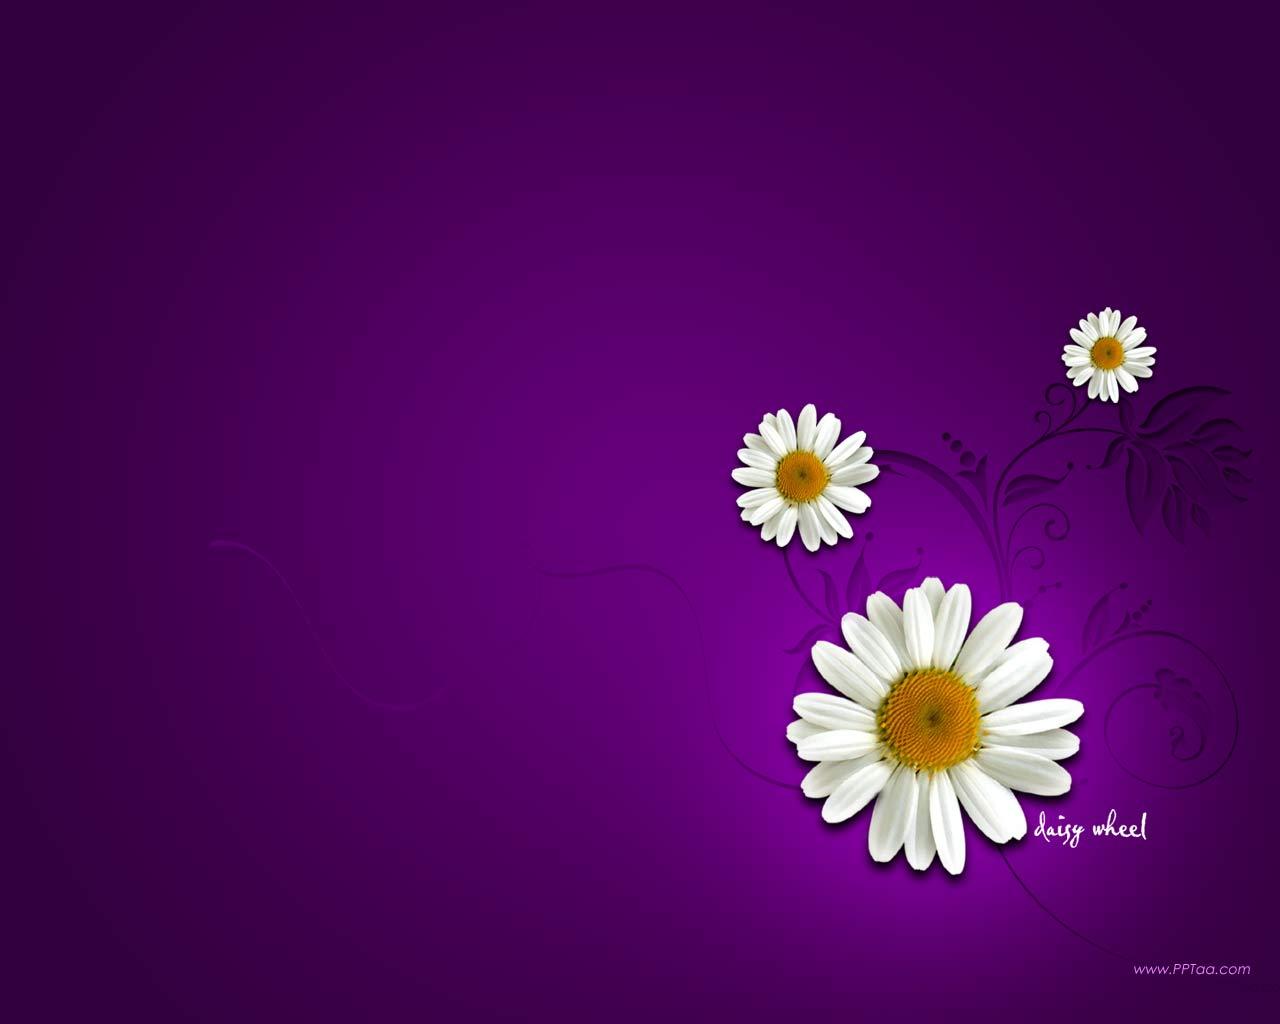 daisy flower wallpaper desktopdaisy flower desktop backgrounddaisy 1280x1024